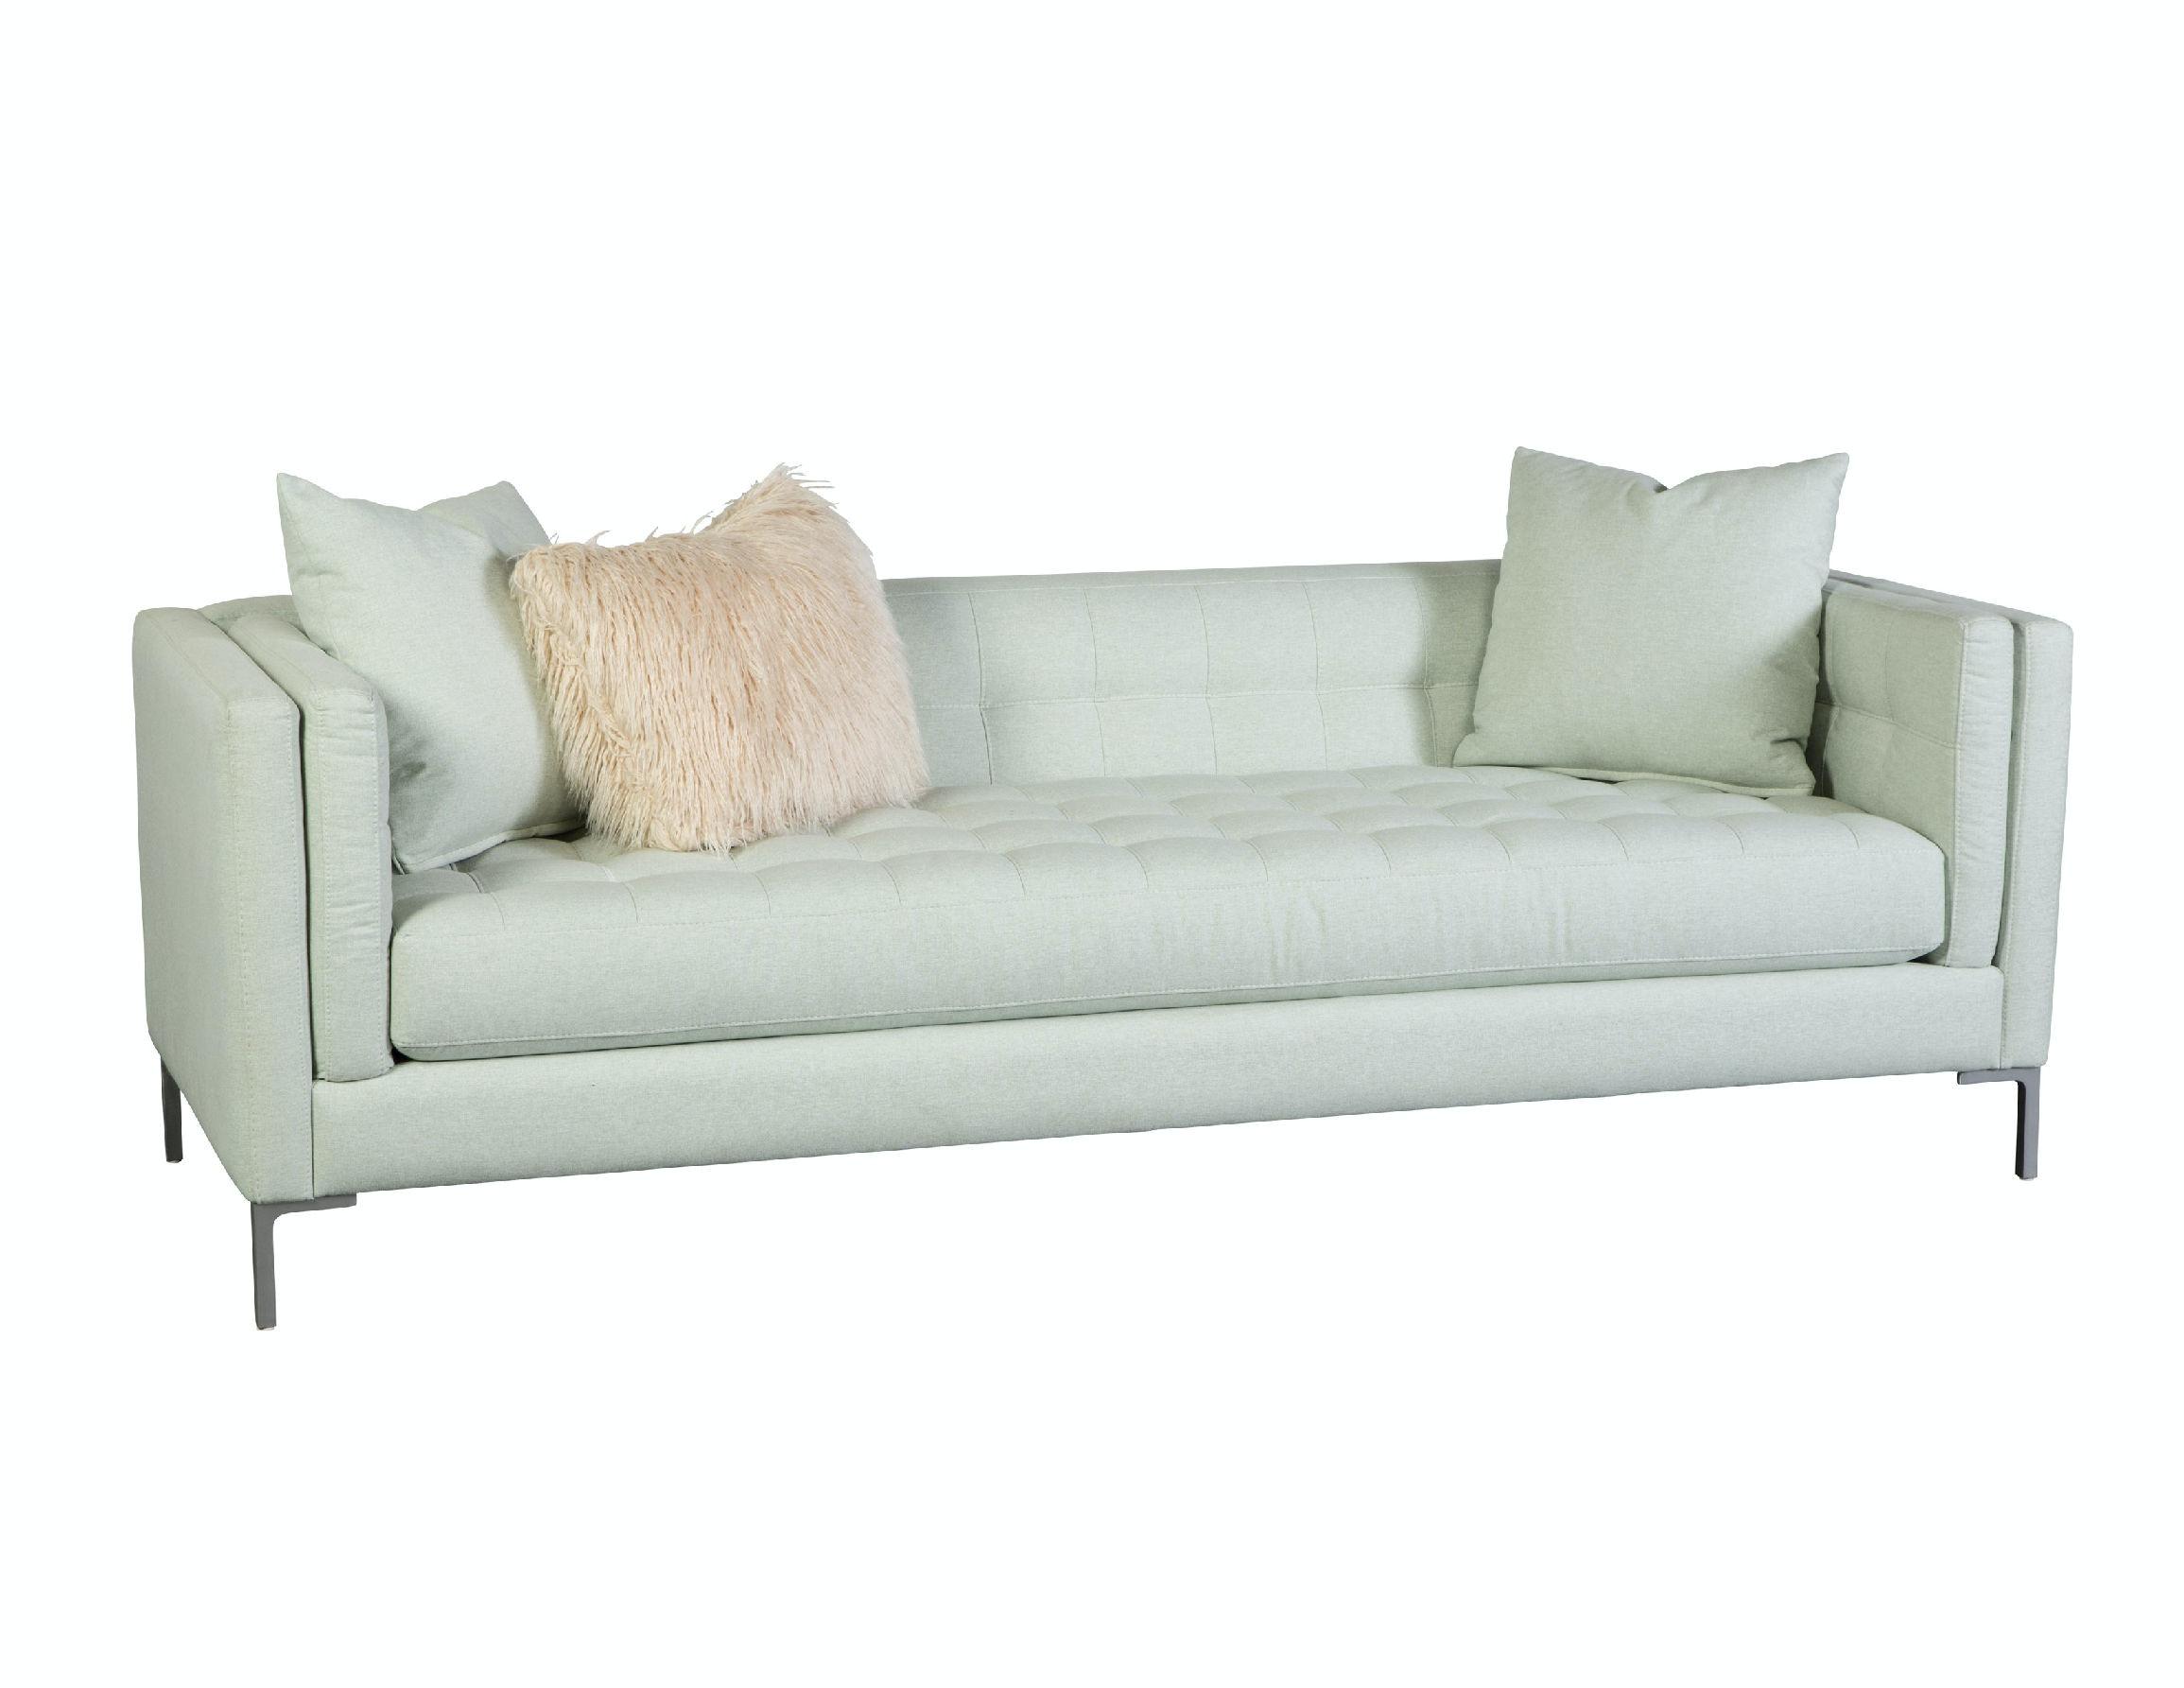 Jonathan Louis International Living Room Estate Sofa 30370 At Indiana  Furniture And Mattress